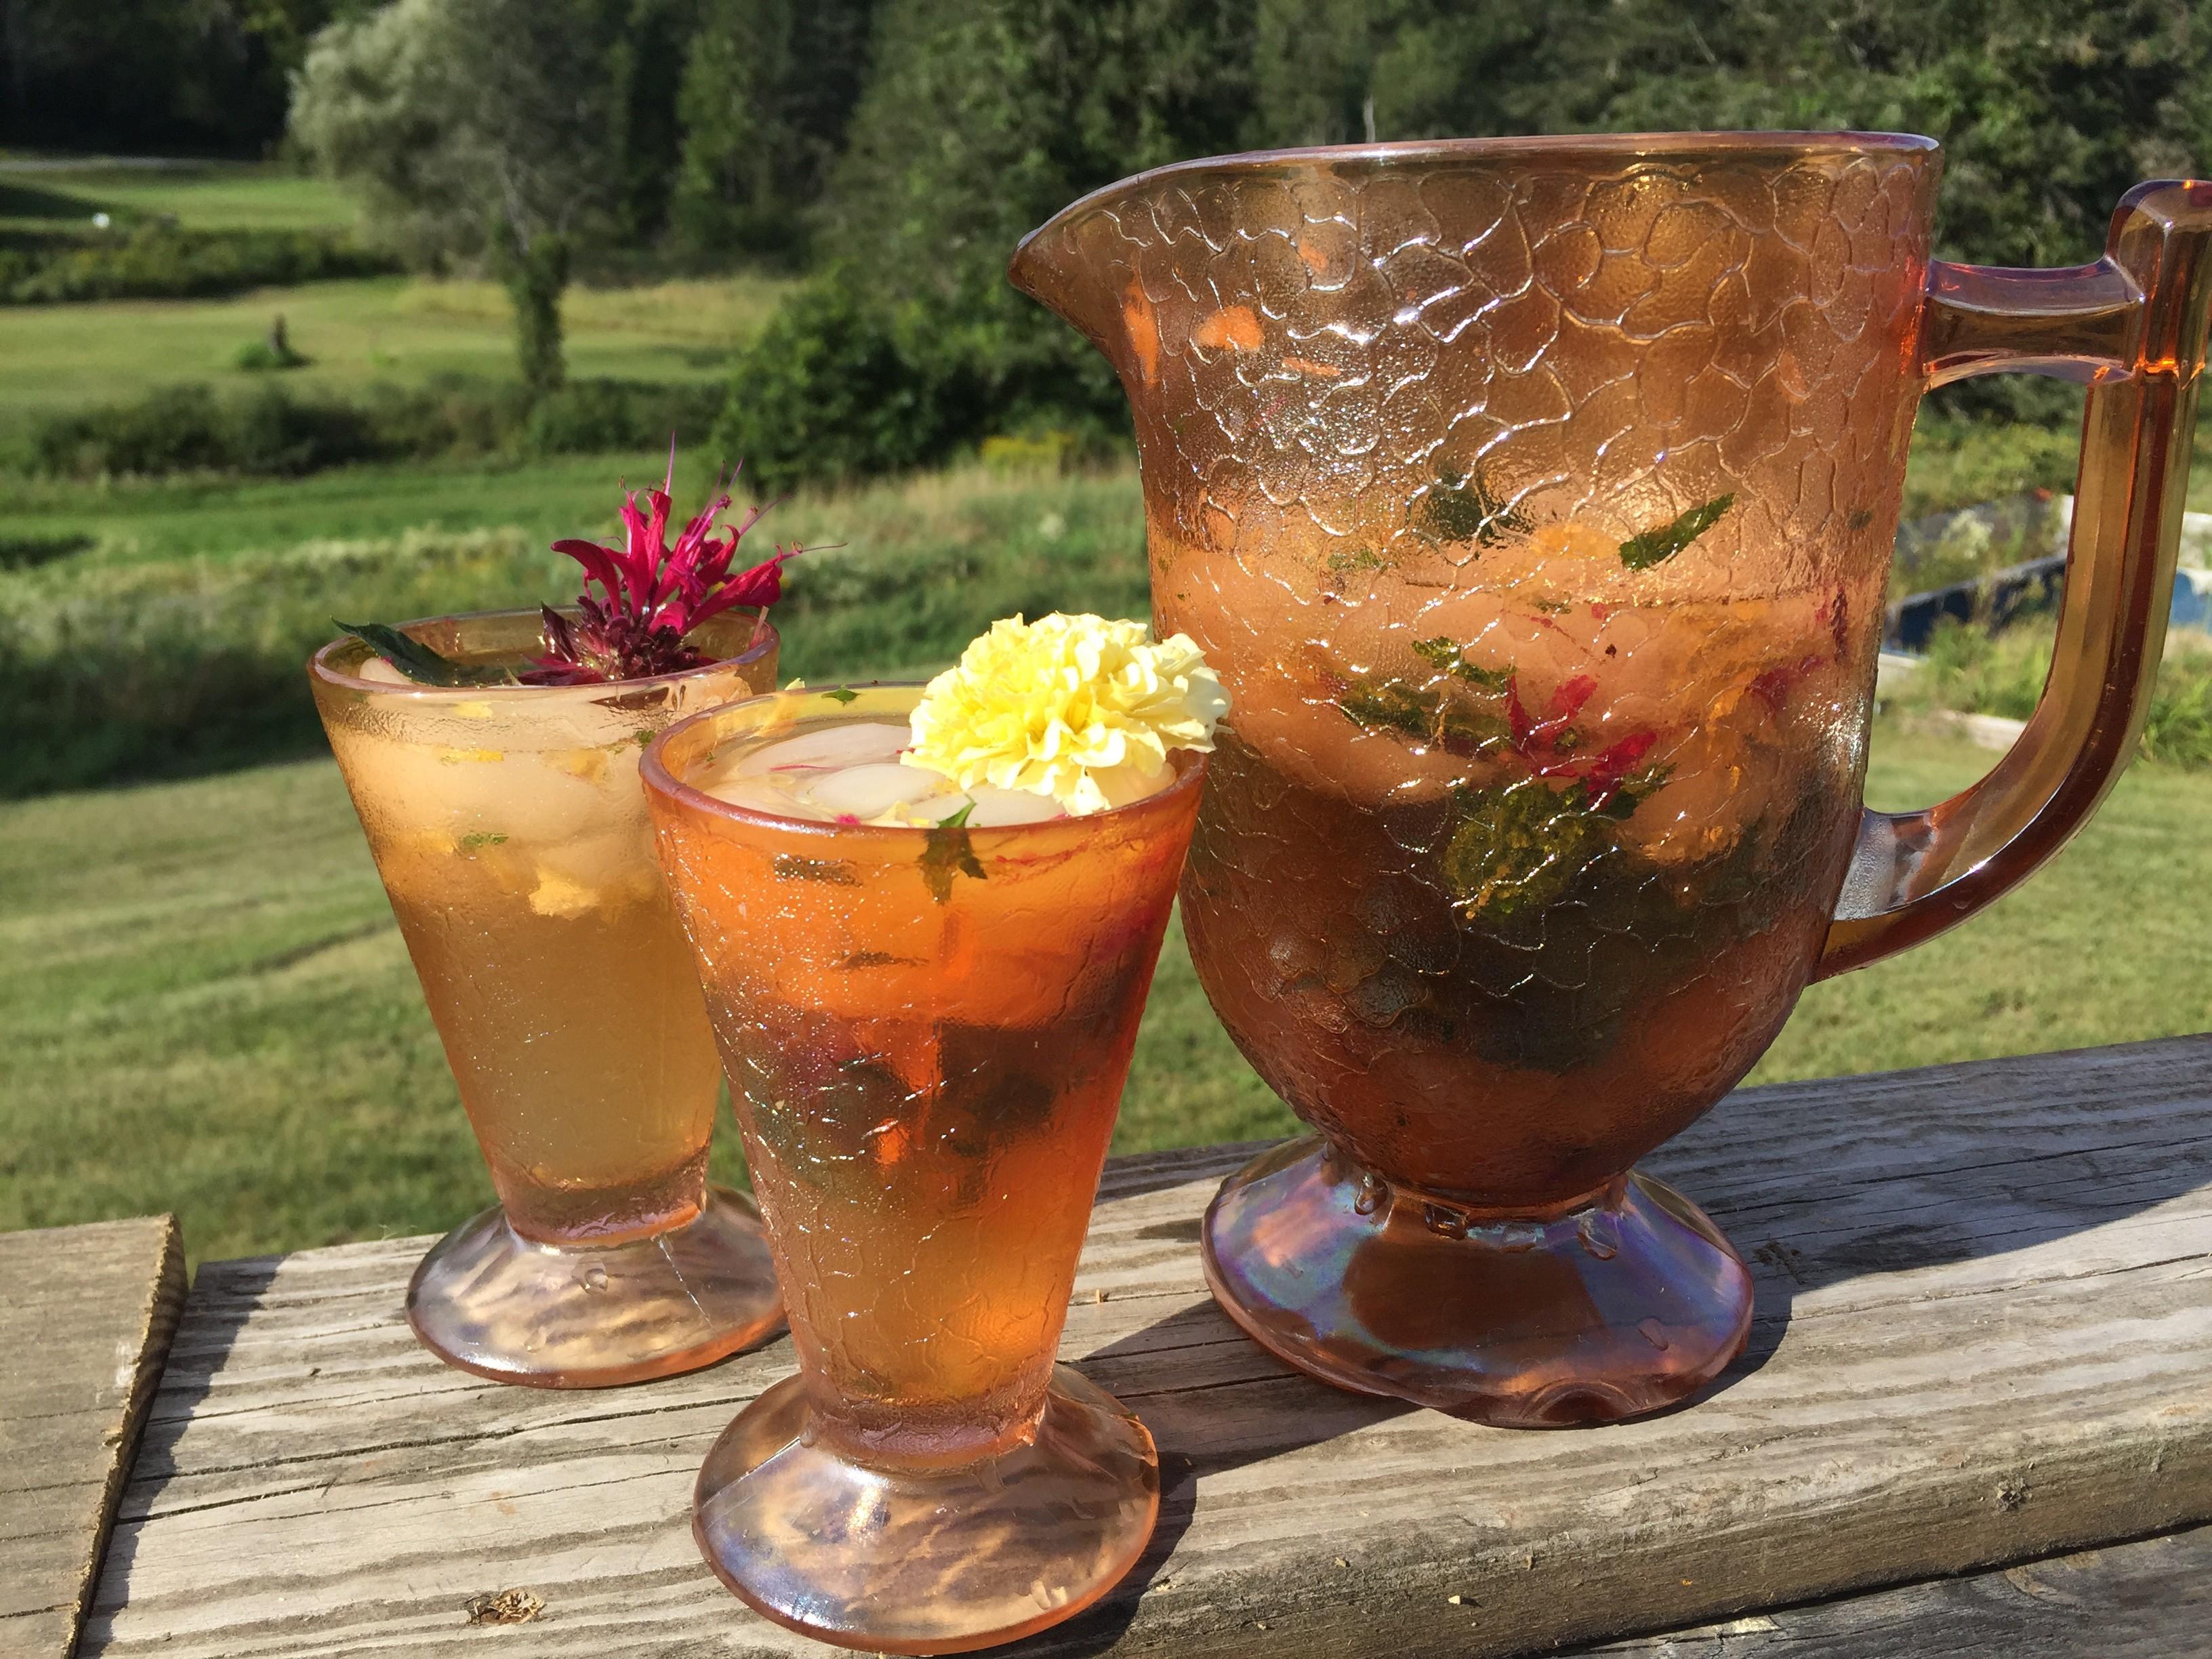 Farmers Market Kitchen: Melon-Marigold Cream Cooler | Bite Club